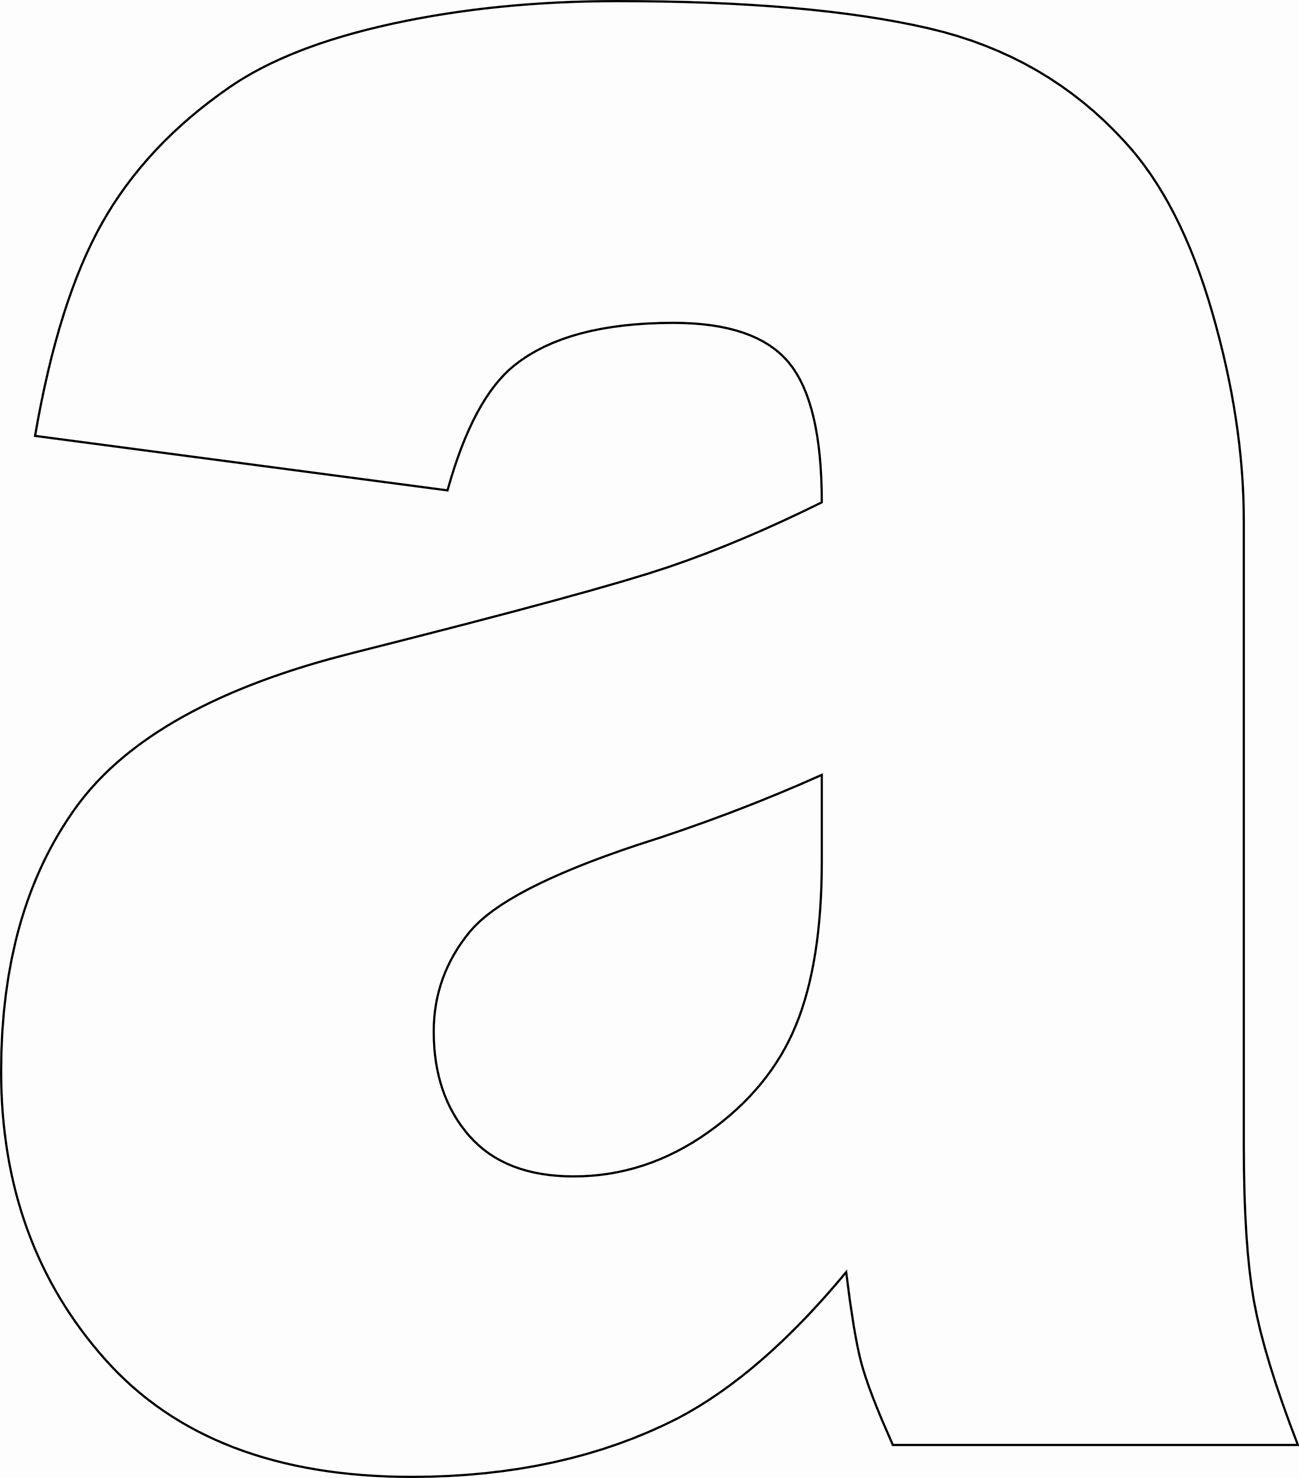 Free Printable Alphabet Templates Awesome Free Printable Lower Case Alphabet Letter Template